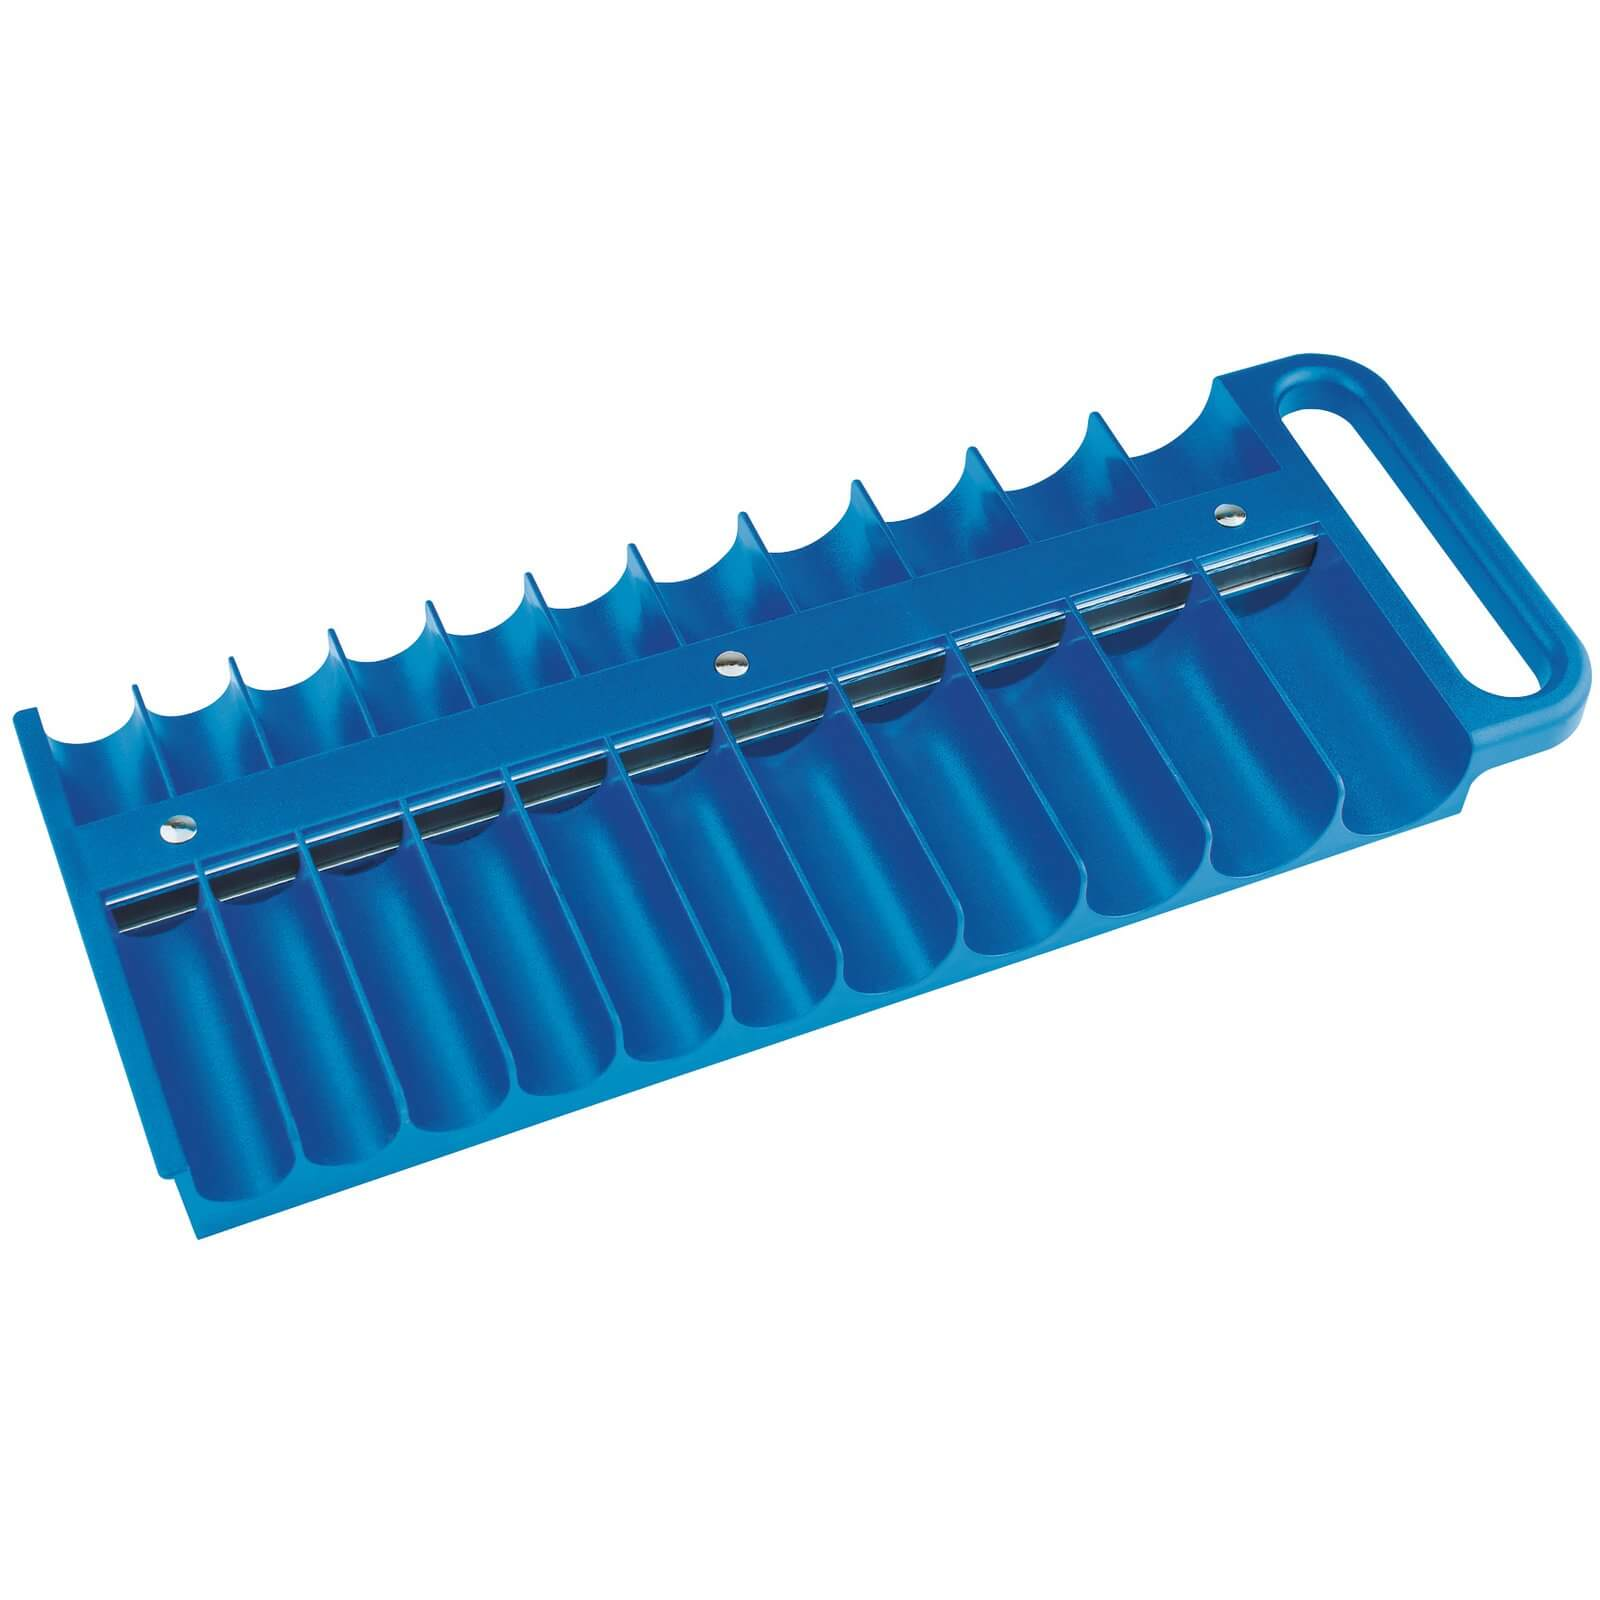 "Image of Draper Magnetic Socket Tray 1/2"""